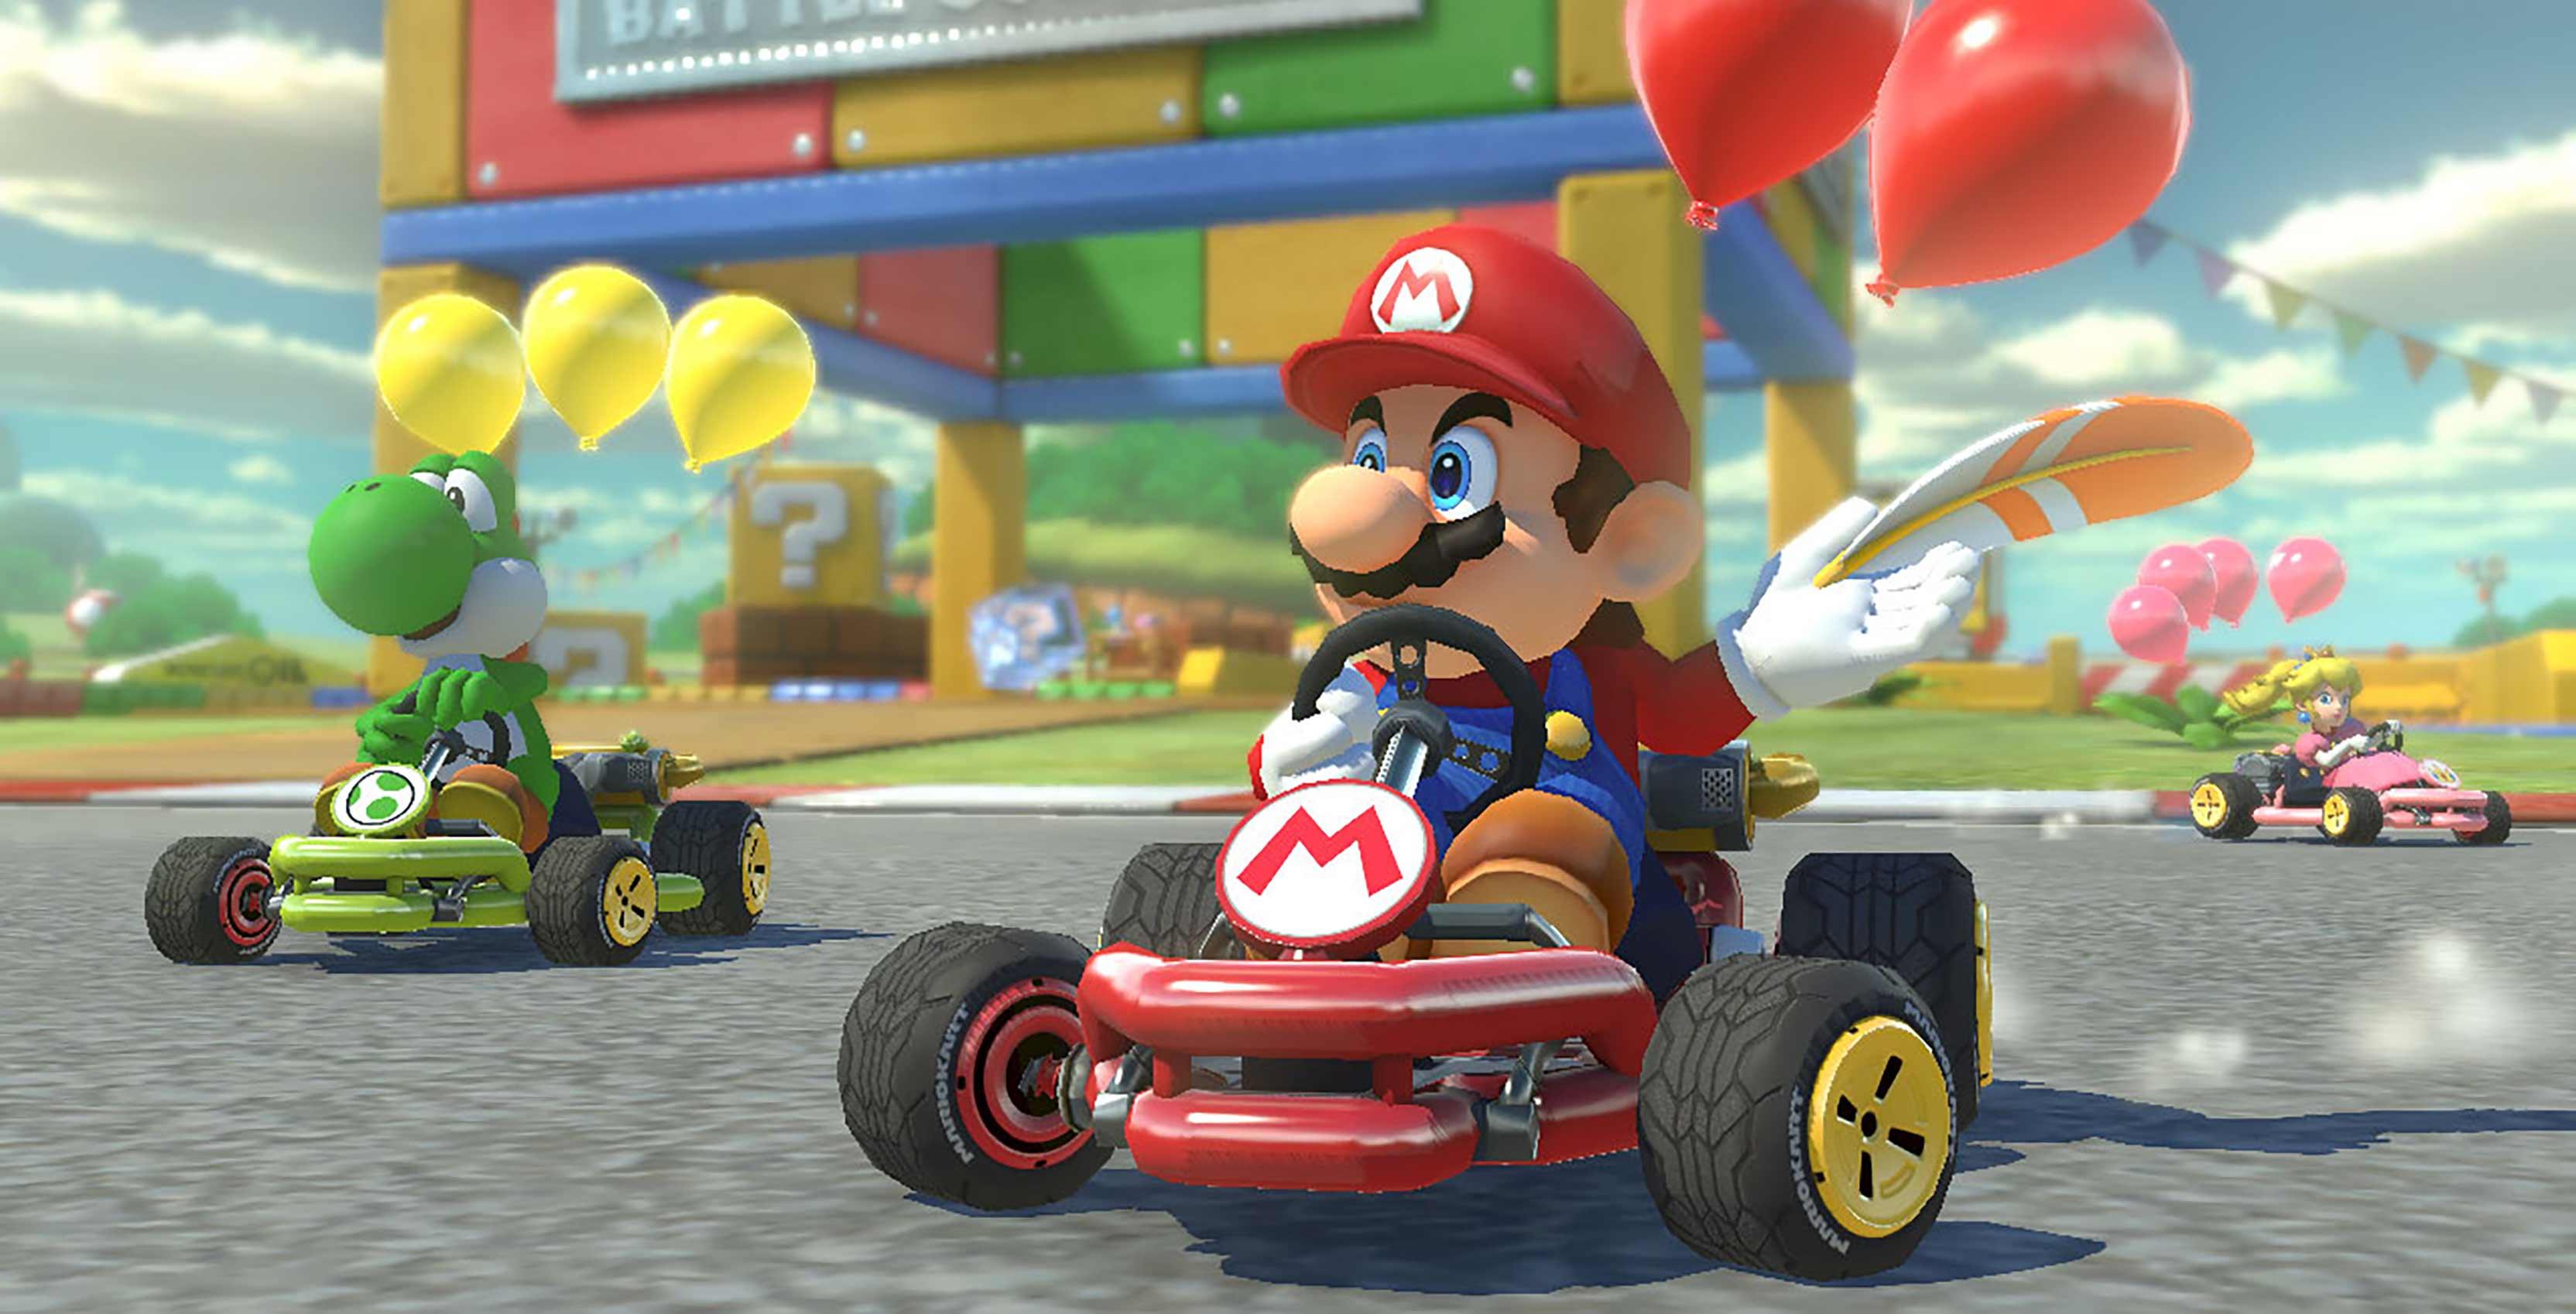 Nintendo holding North American online Mario Kart 8 Deluxe tournament this weekend